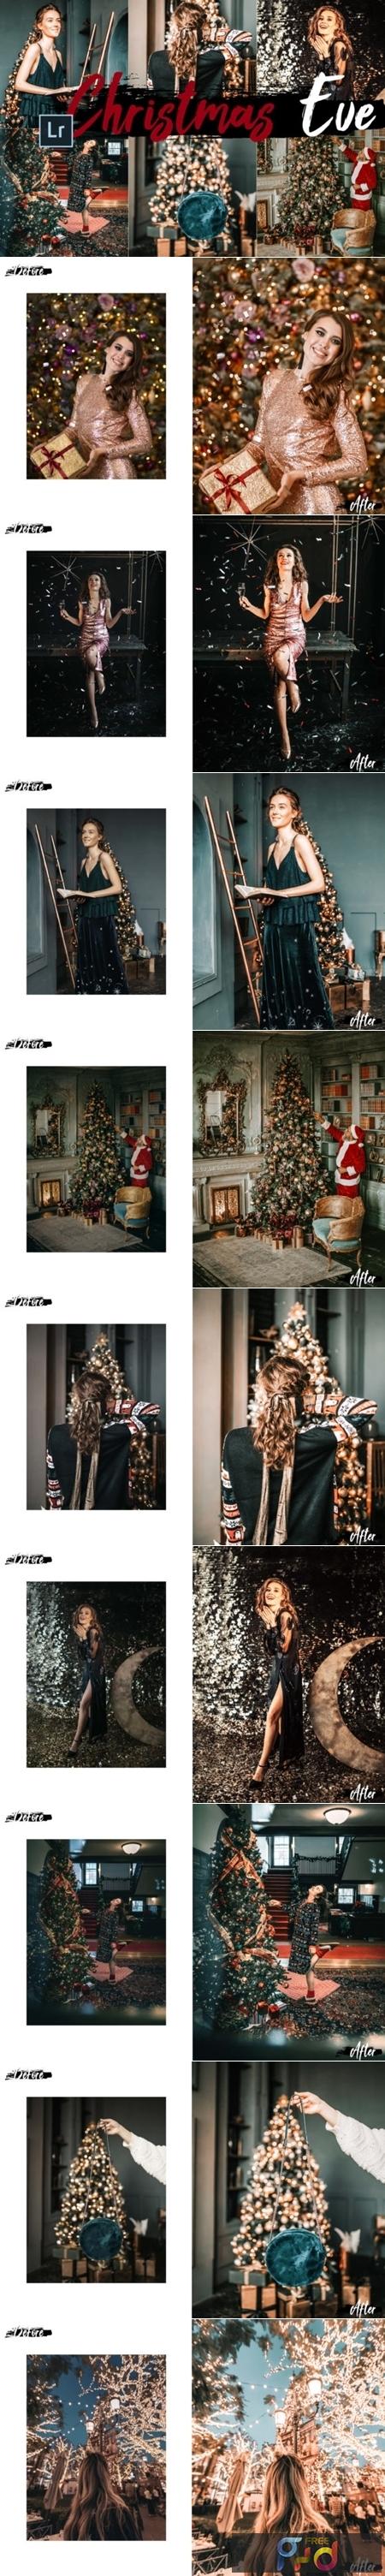 5 Christmas Eve Desktop Lightroom Preset 2239051 1